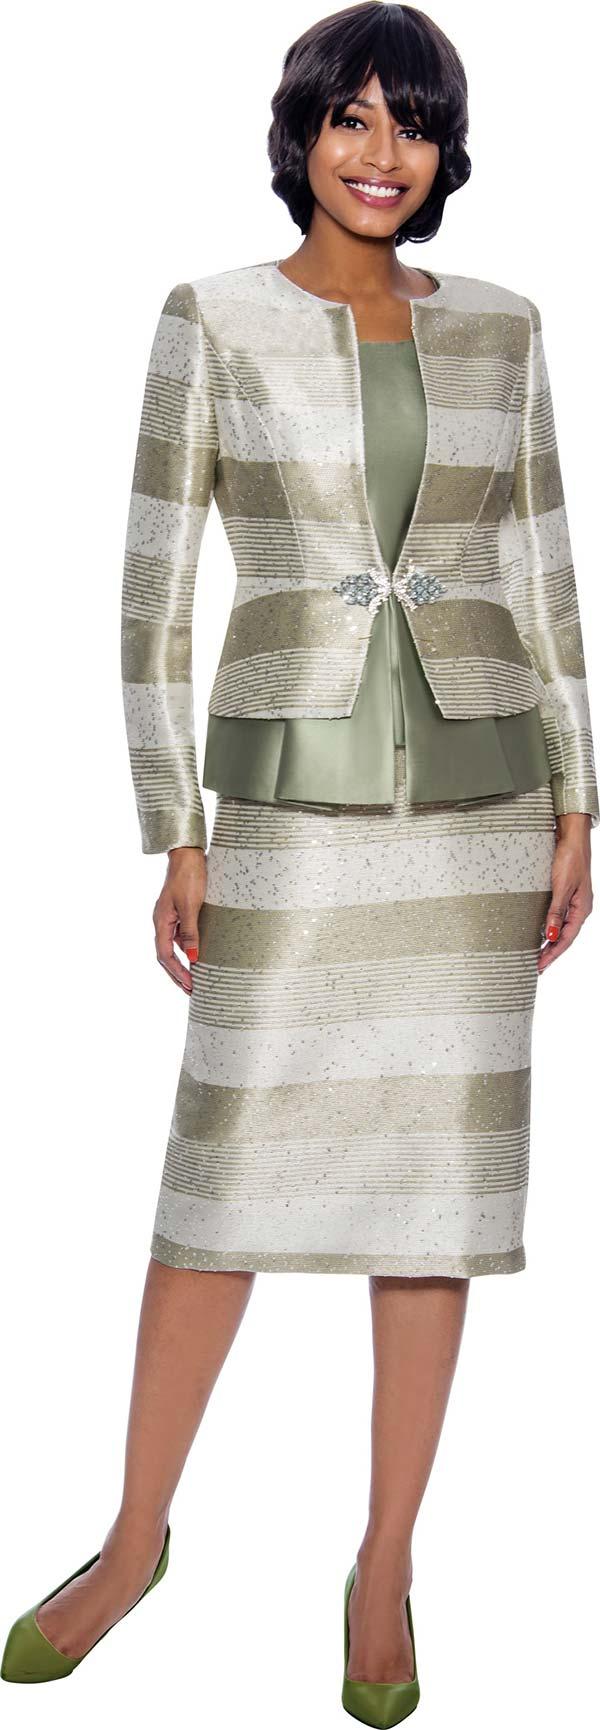 Susanna 3927-Sage - Multi Stripe Design Three Piece Skirt Suit